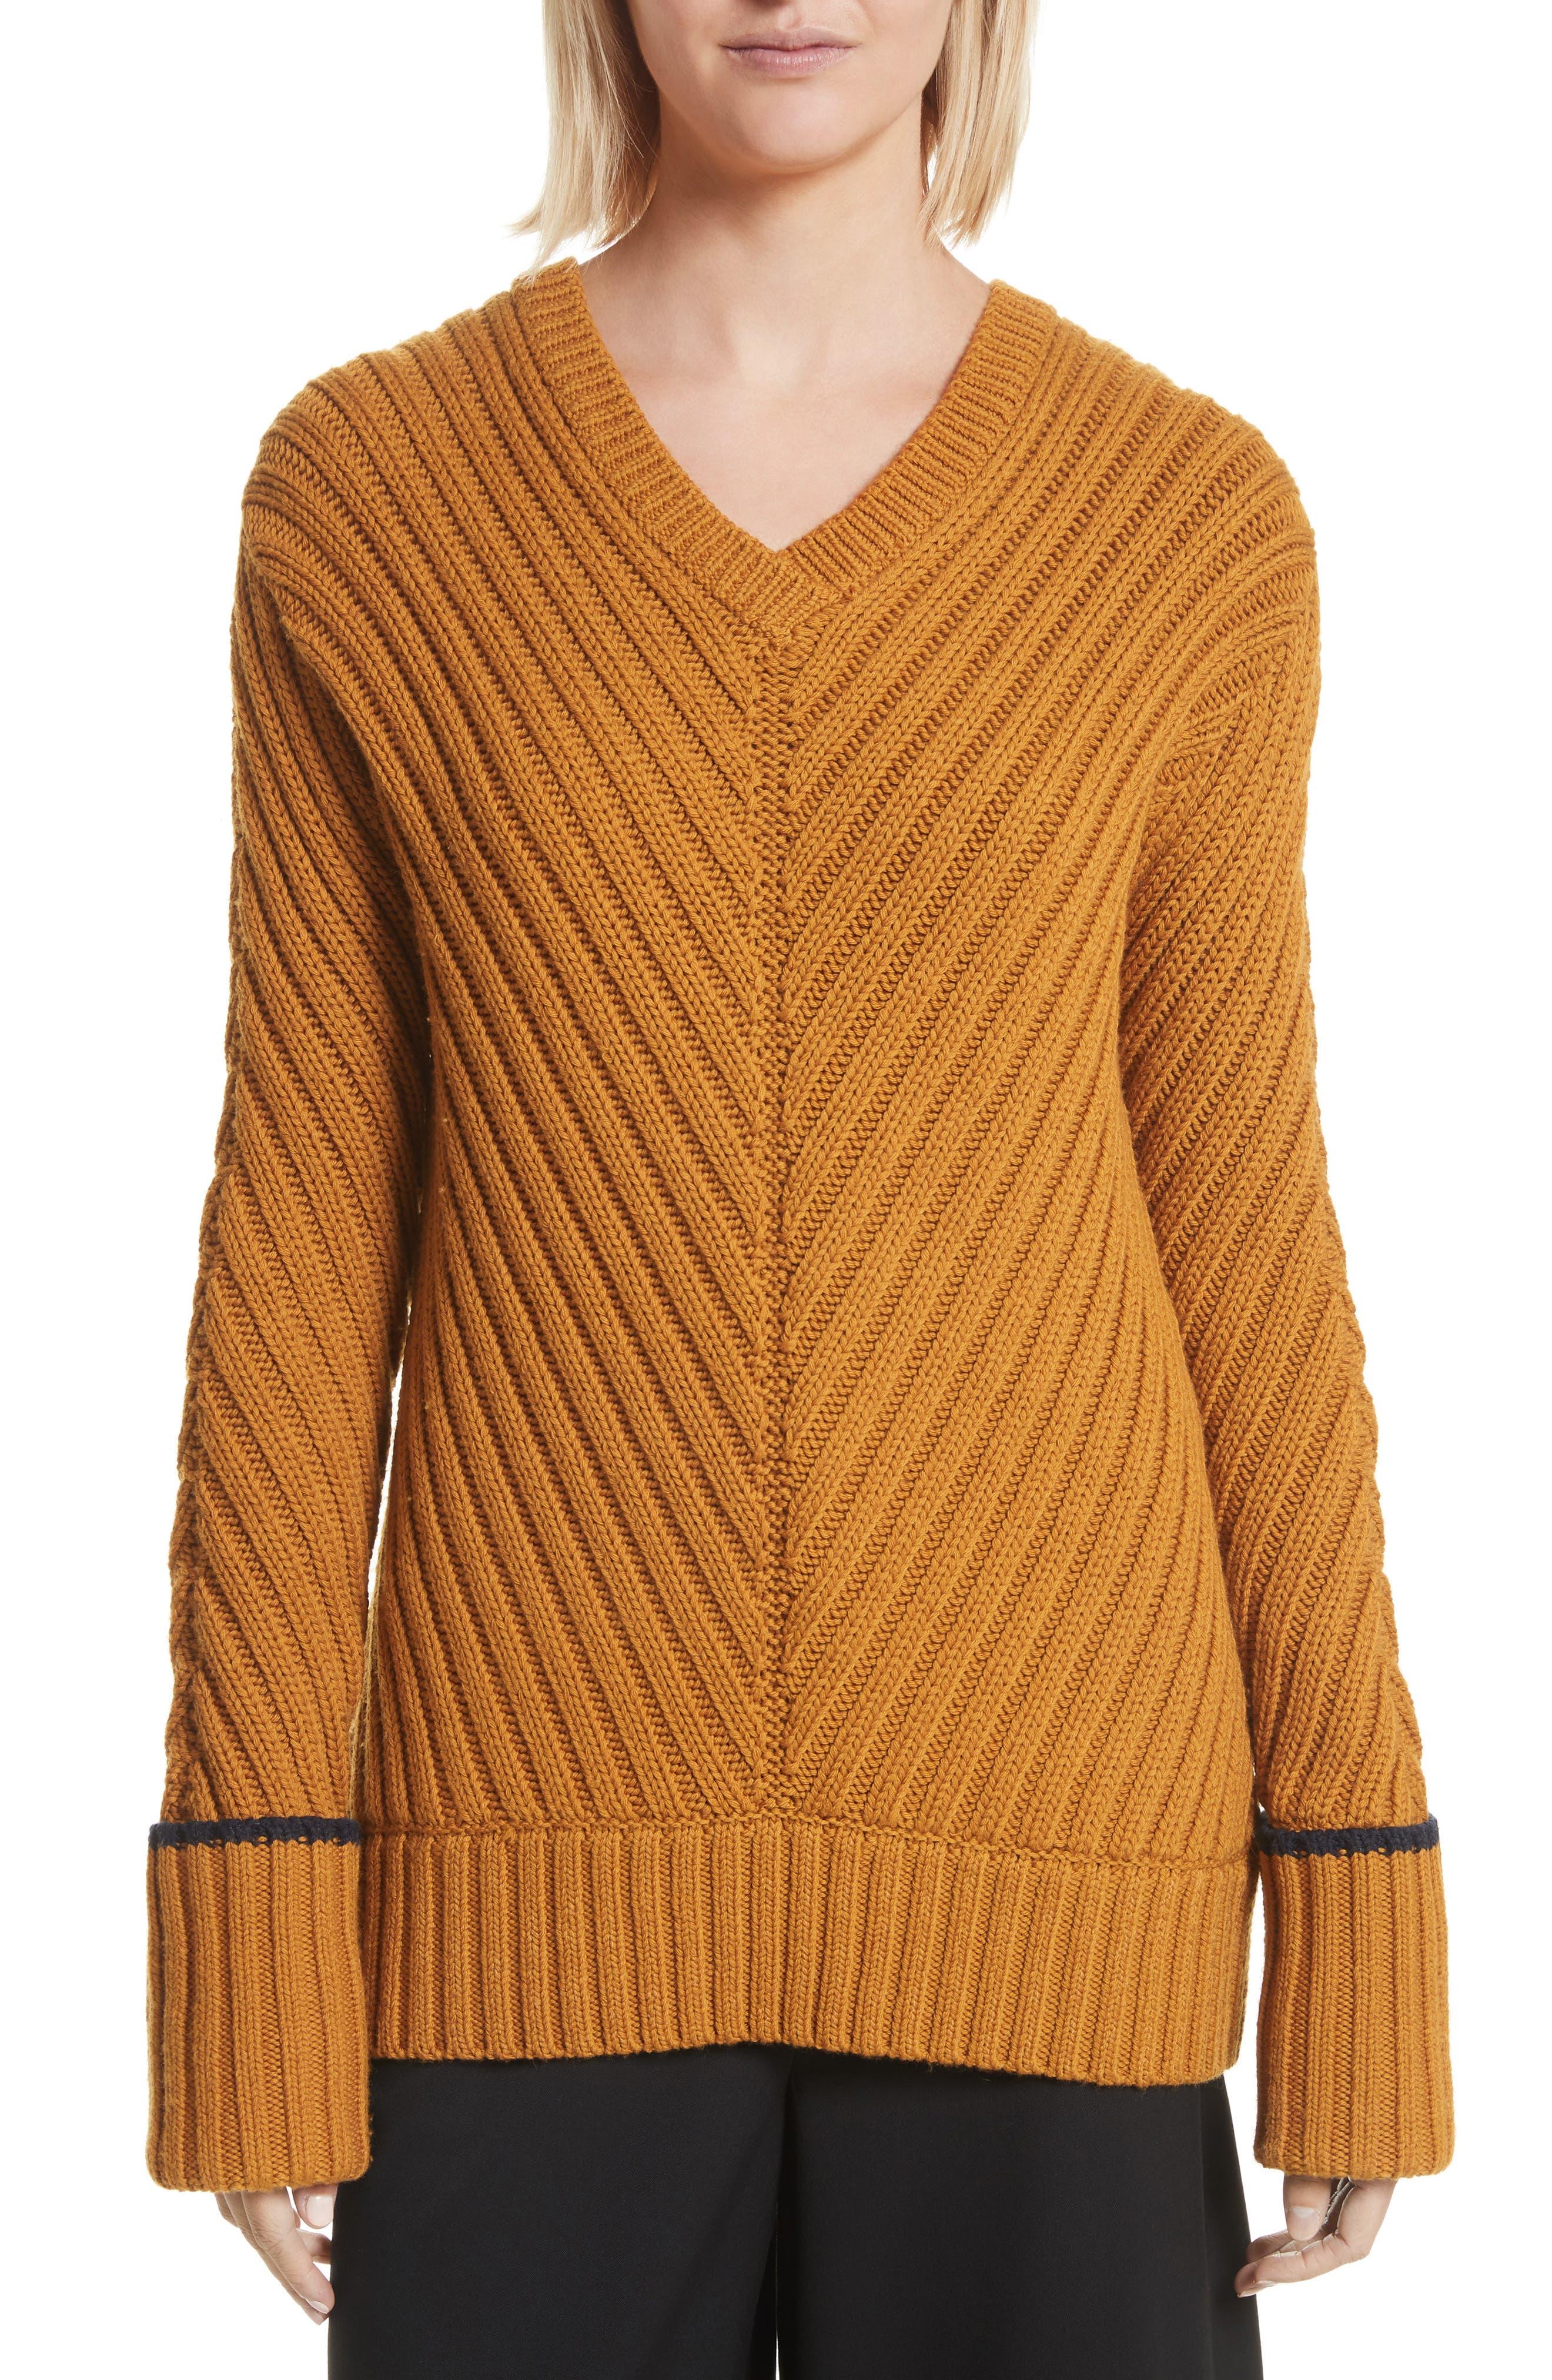 Rib Knit Wool Blend Sweater,                             Main thumbnail 1, color,                             466